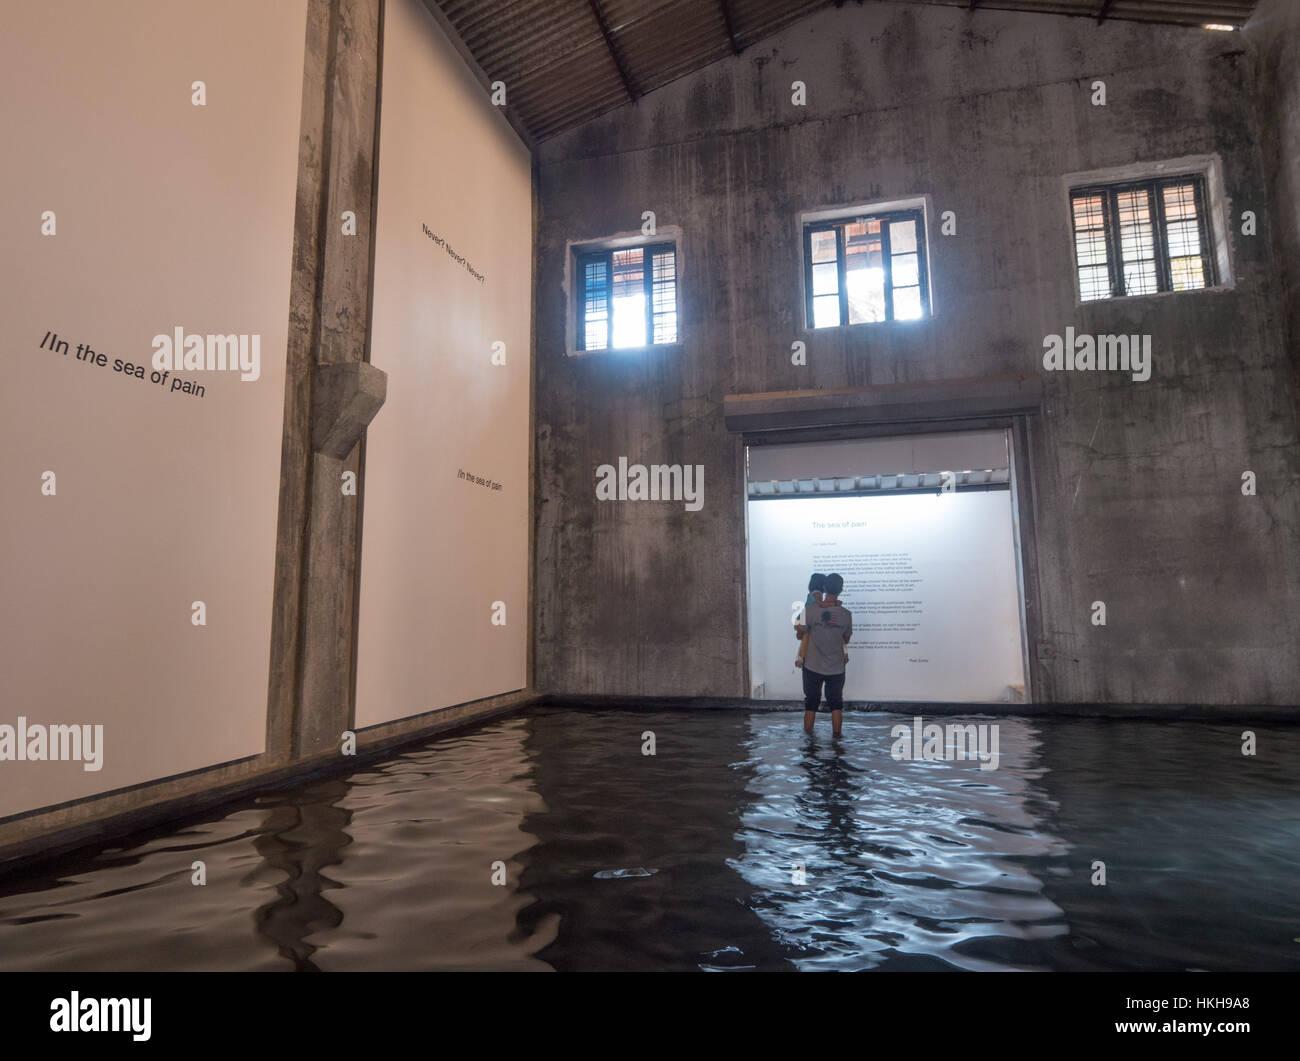 The Sea of Pain by Raul Zurita Aspinwall House at Kochi-Muziris Biennale in India - Stock Image